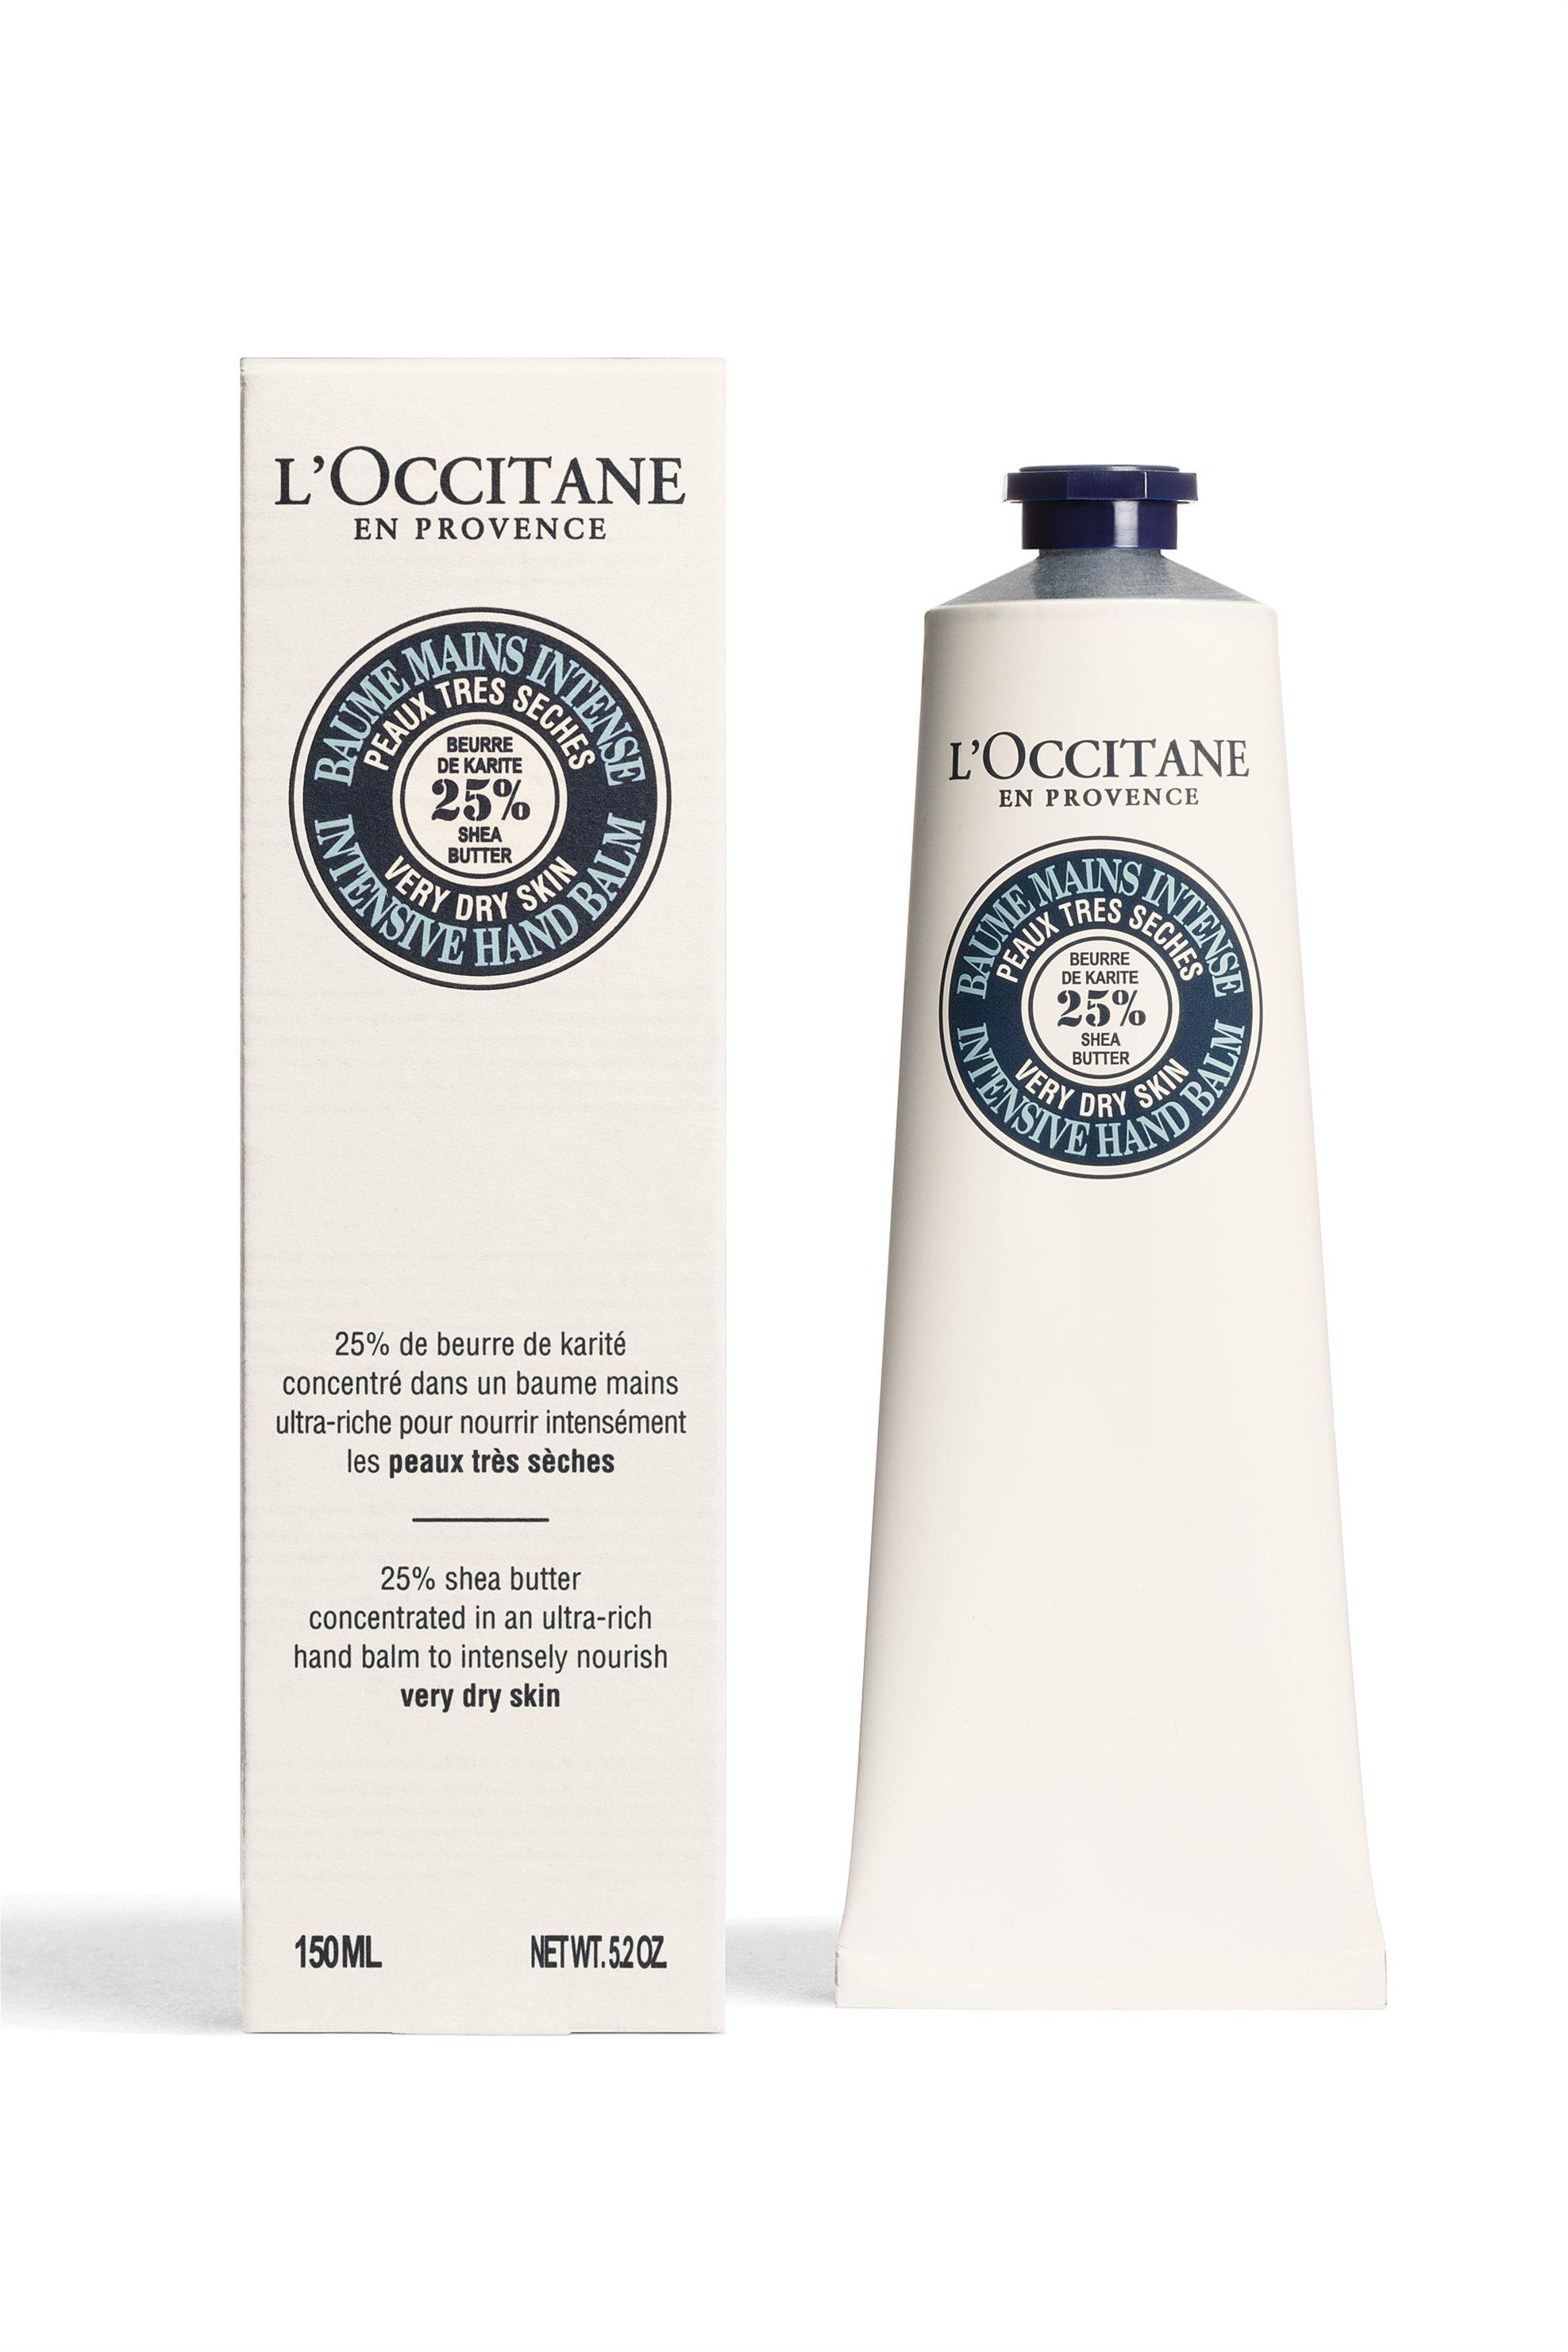 L' Occitane En Provence Shea Butter Intensive Hand Balm 150 ml - 3253581453735 ομορφια   φυτικα καλλυντικα   περιποίηση σώματος   περιποίηση χεριών